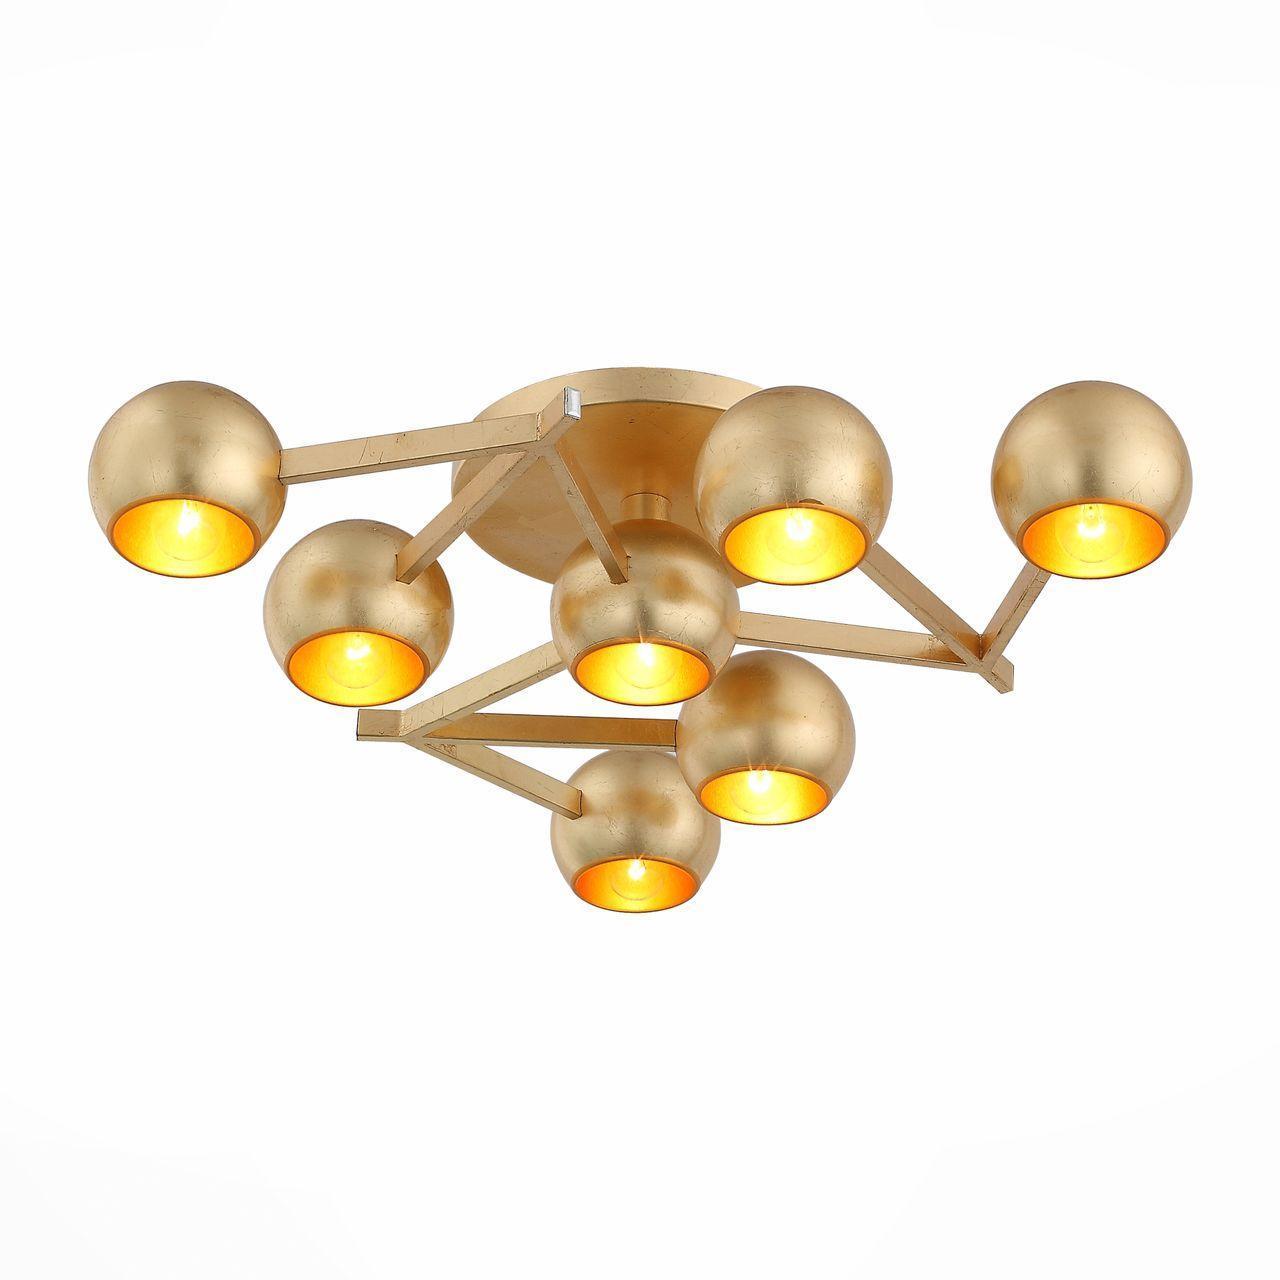 Люстра ST Luce Rottura SL853.202.07 потолочная люстра st luce rottura sl853 602 07 потолочная